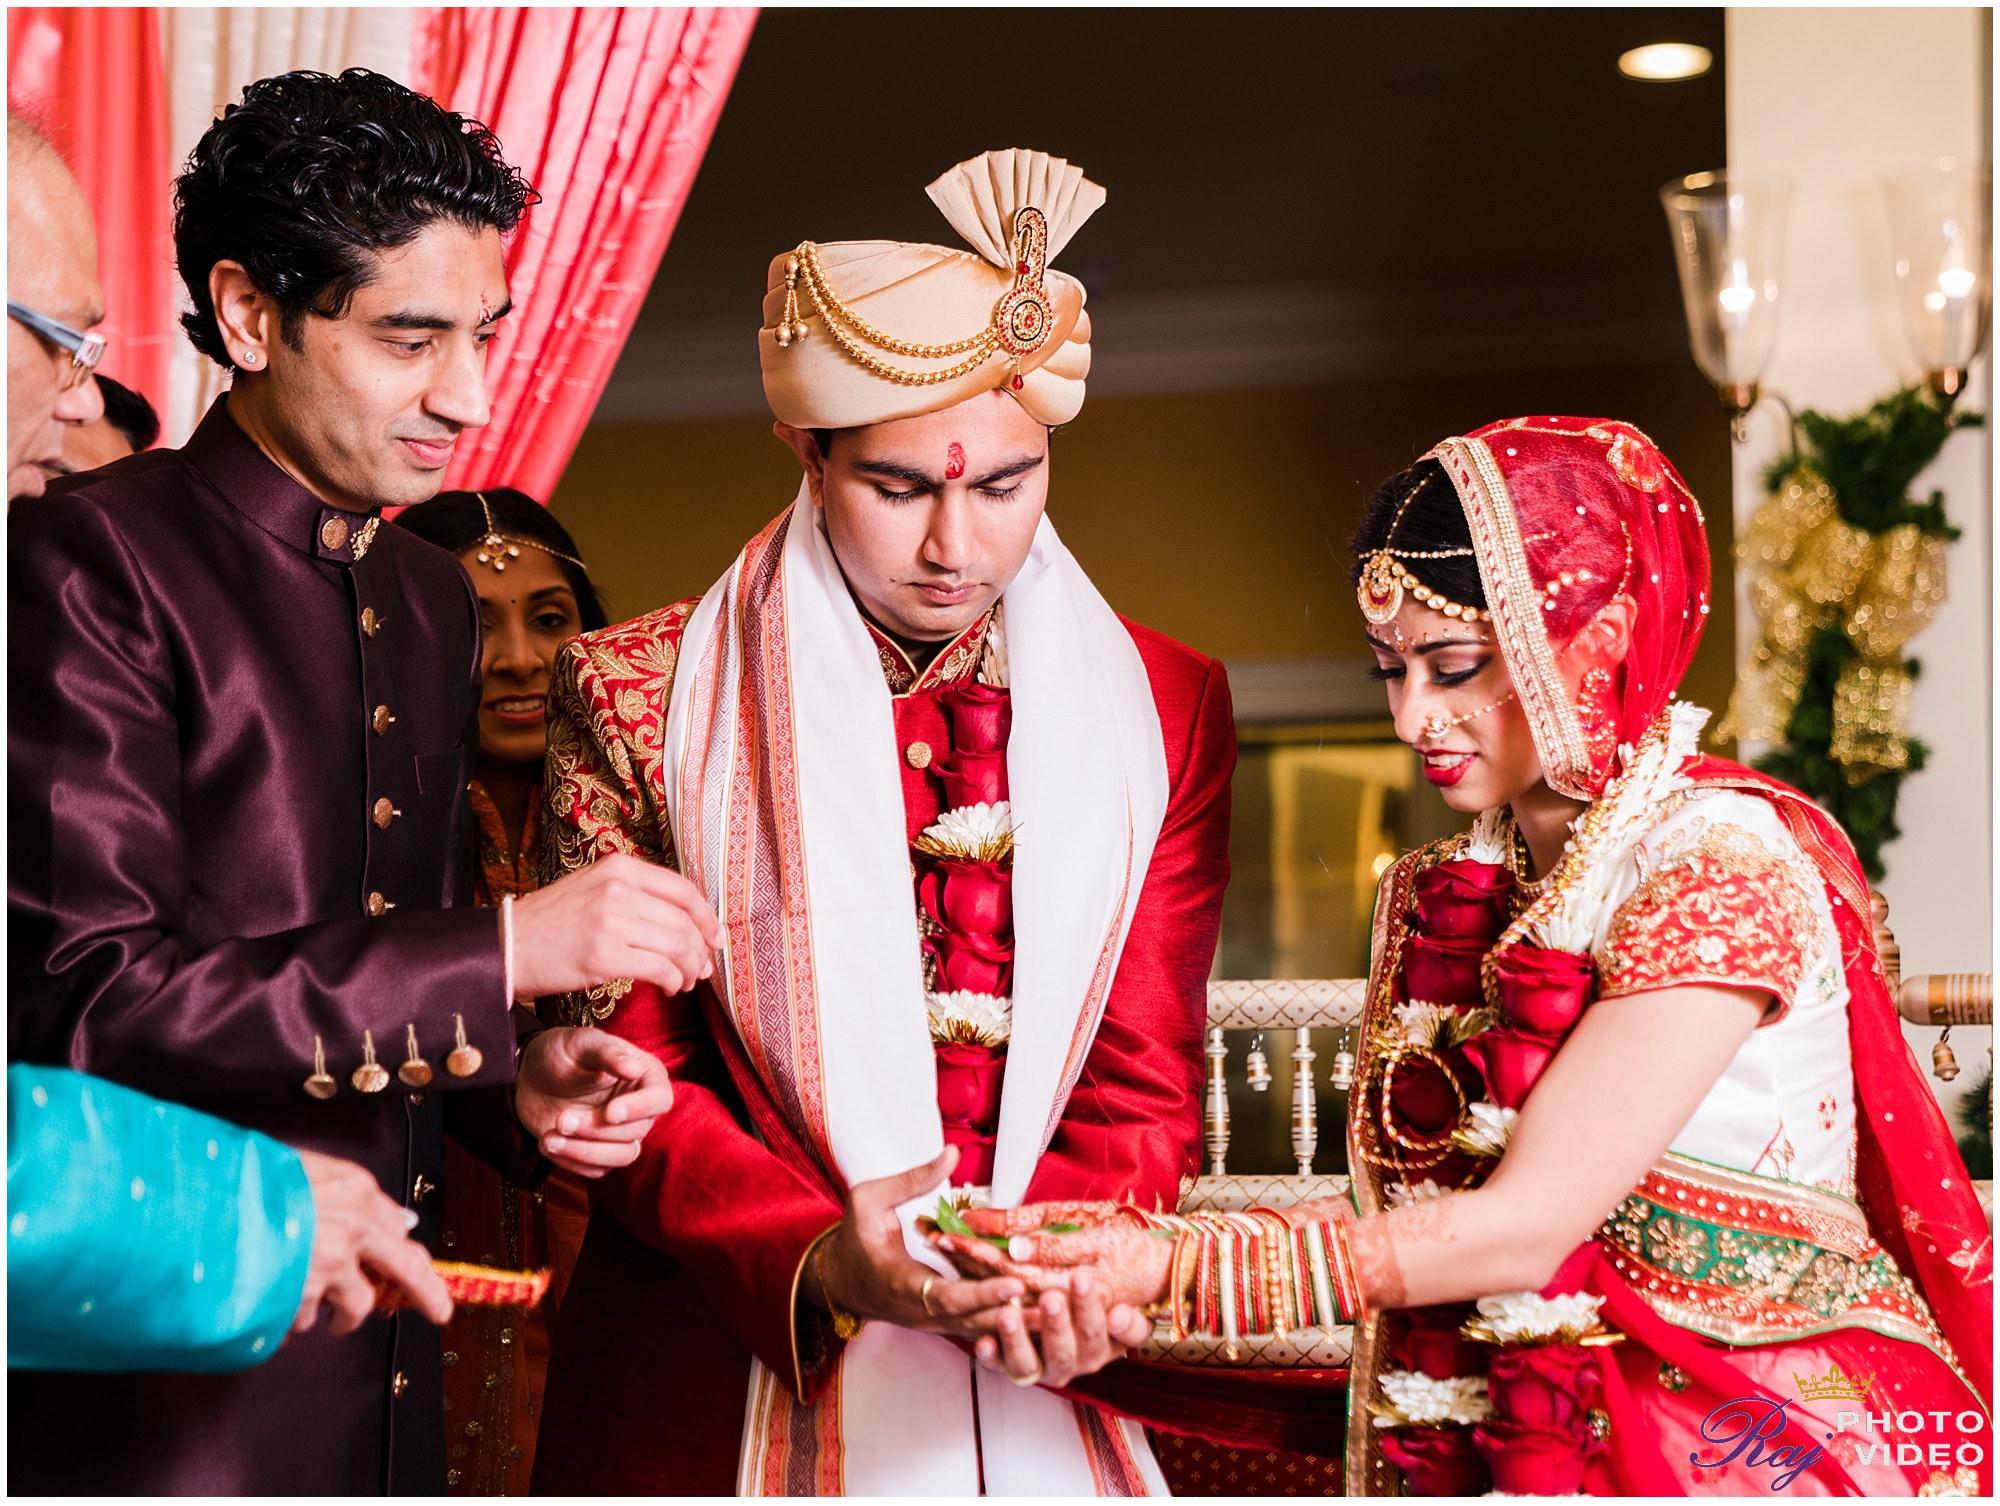 Founders-Inn-and-Spa-Virginia-Beach-VA-Indian-Wedding-Harini-Vivek-41.jpg